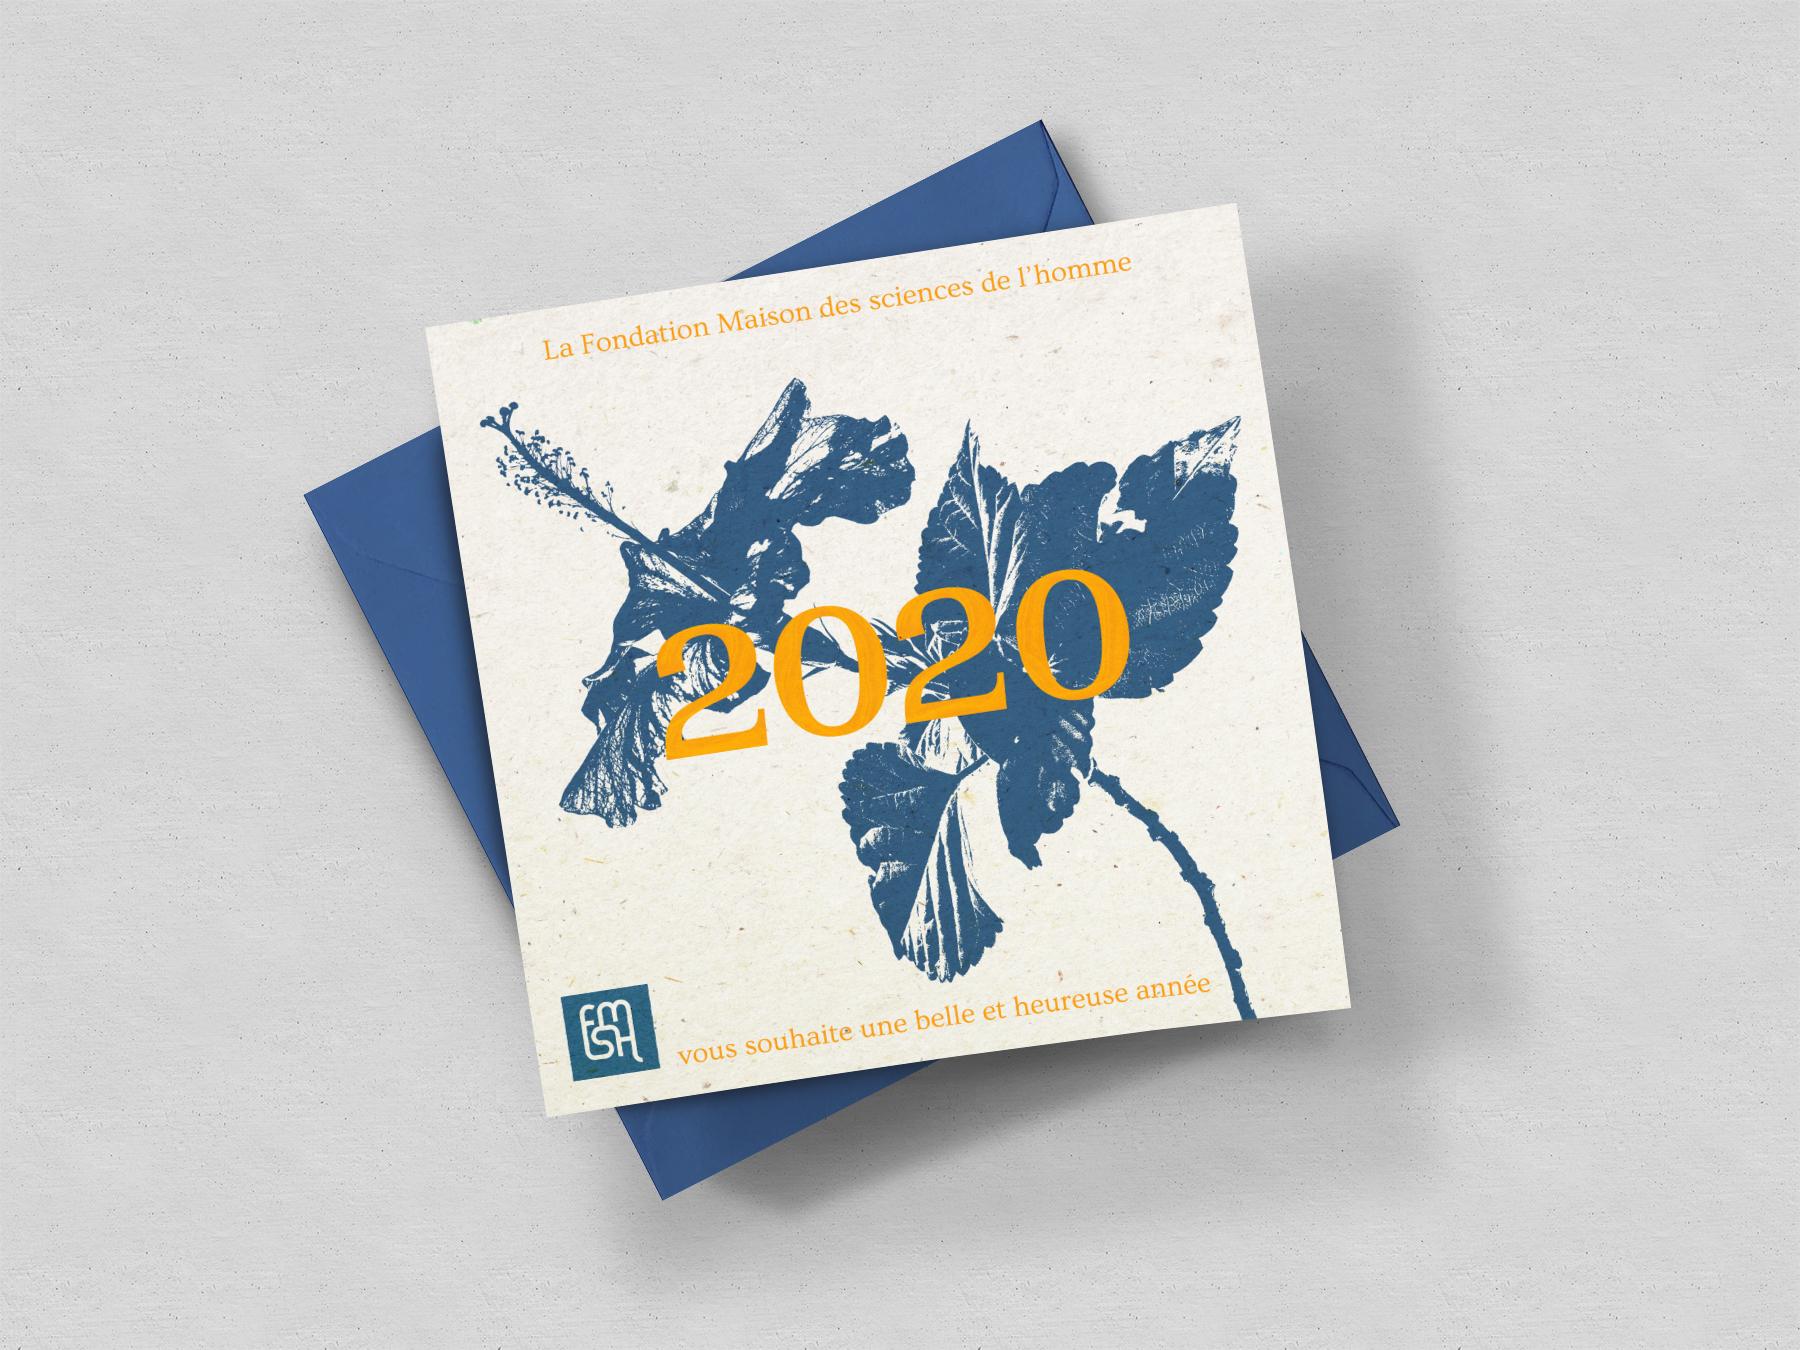 FMSH2020 Card Mockup